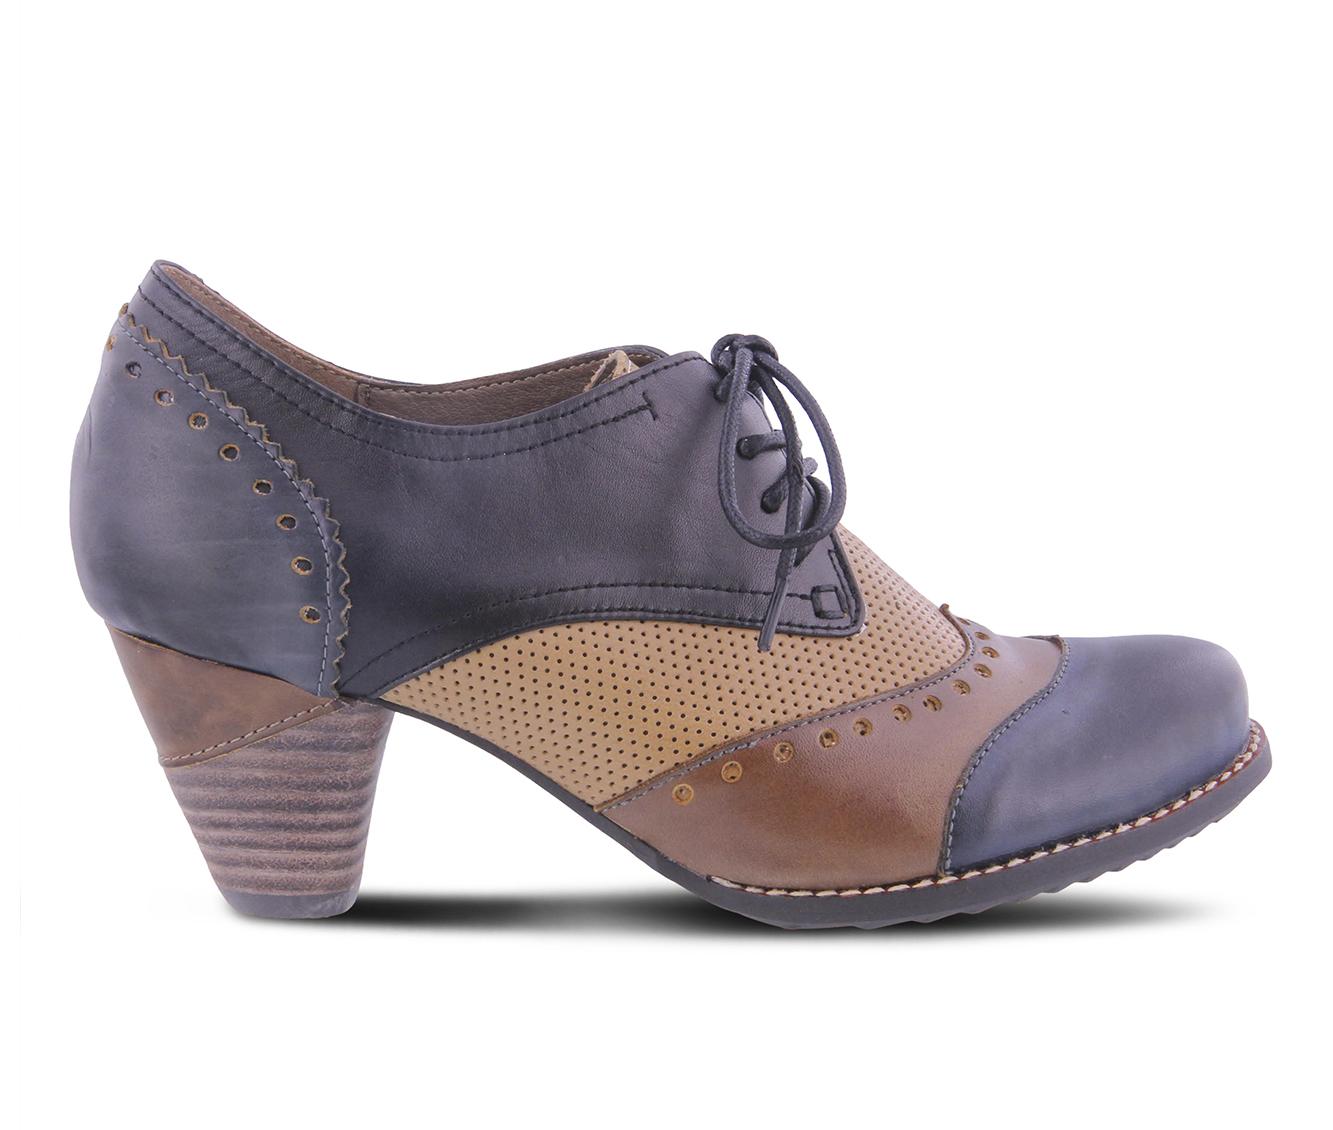 L'Artiste Bardot Women's Dress Shoe (Blue Leather)